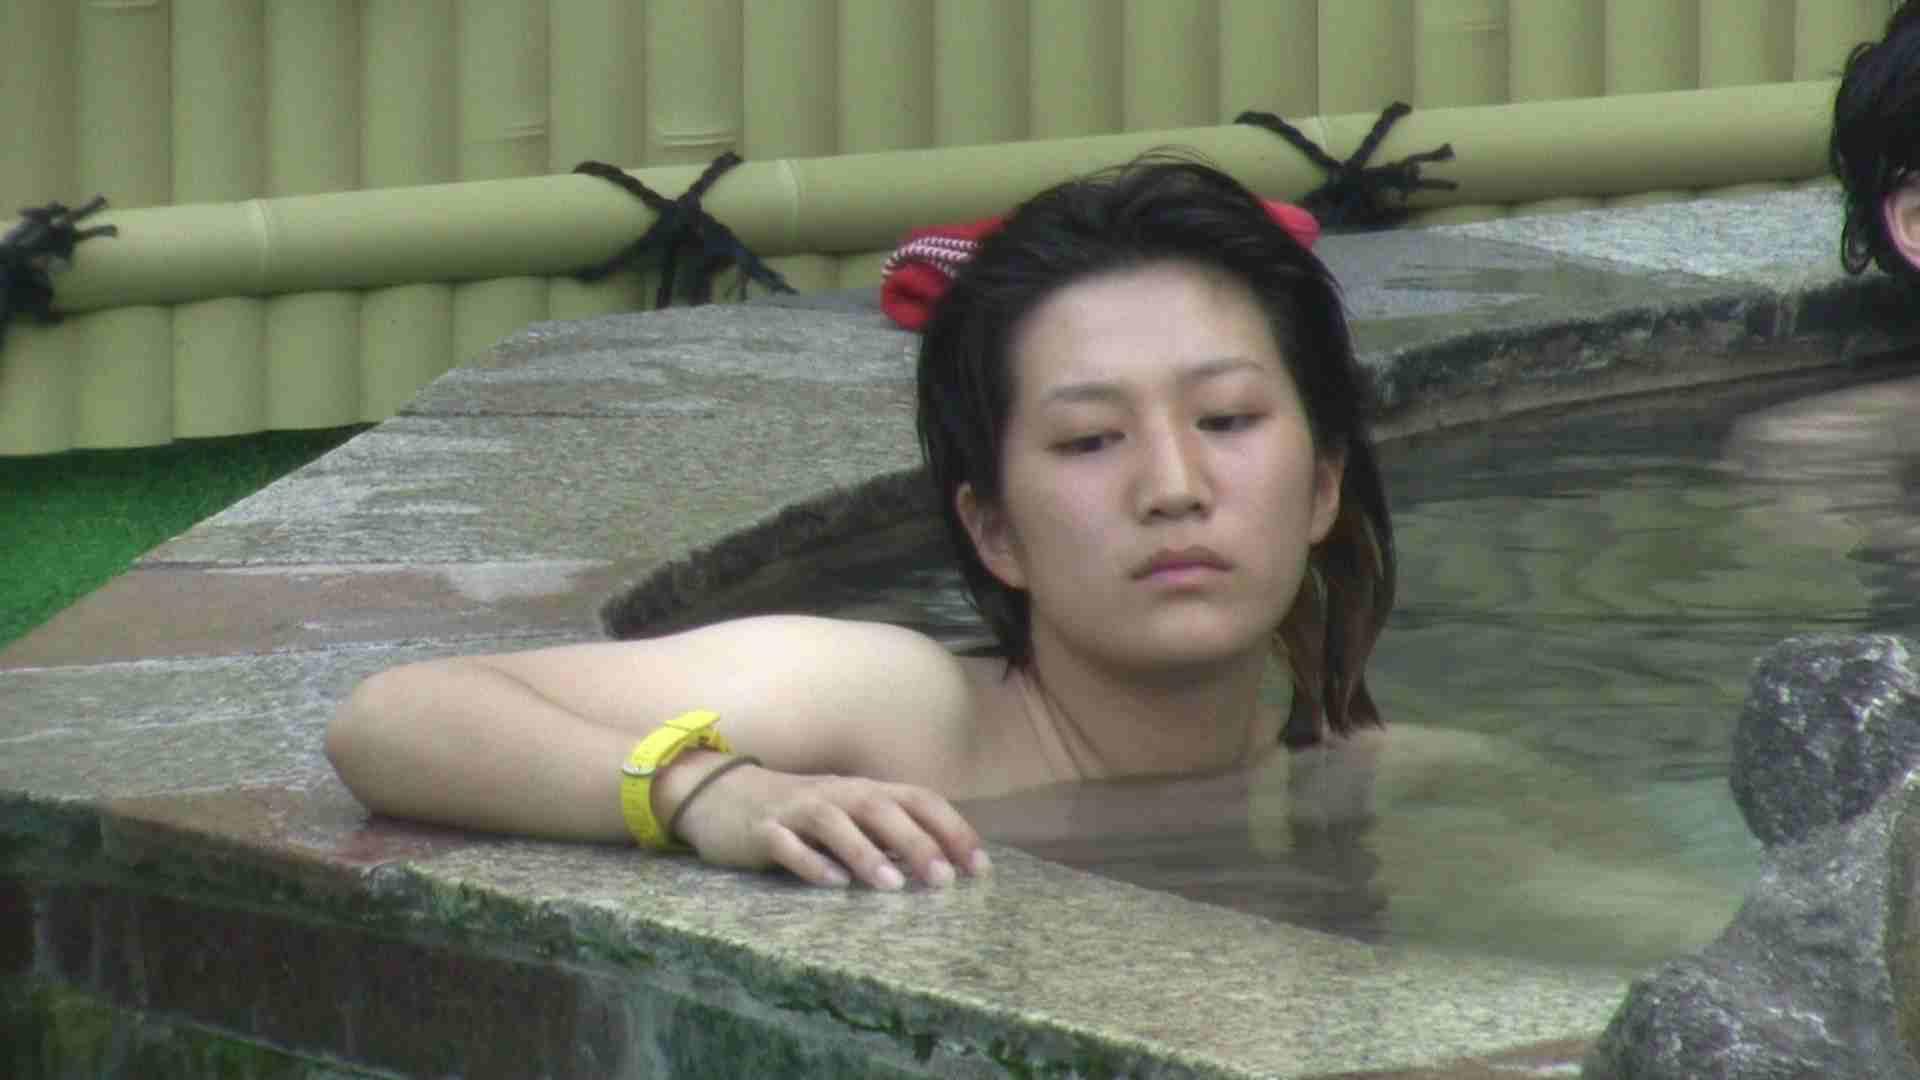 Aquaな露天風呂Vol.132 0  61連発 10